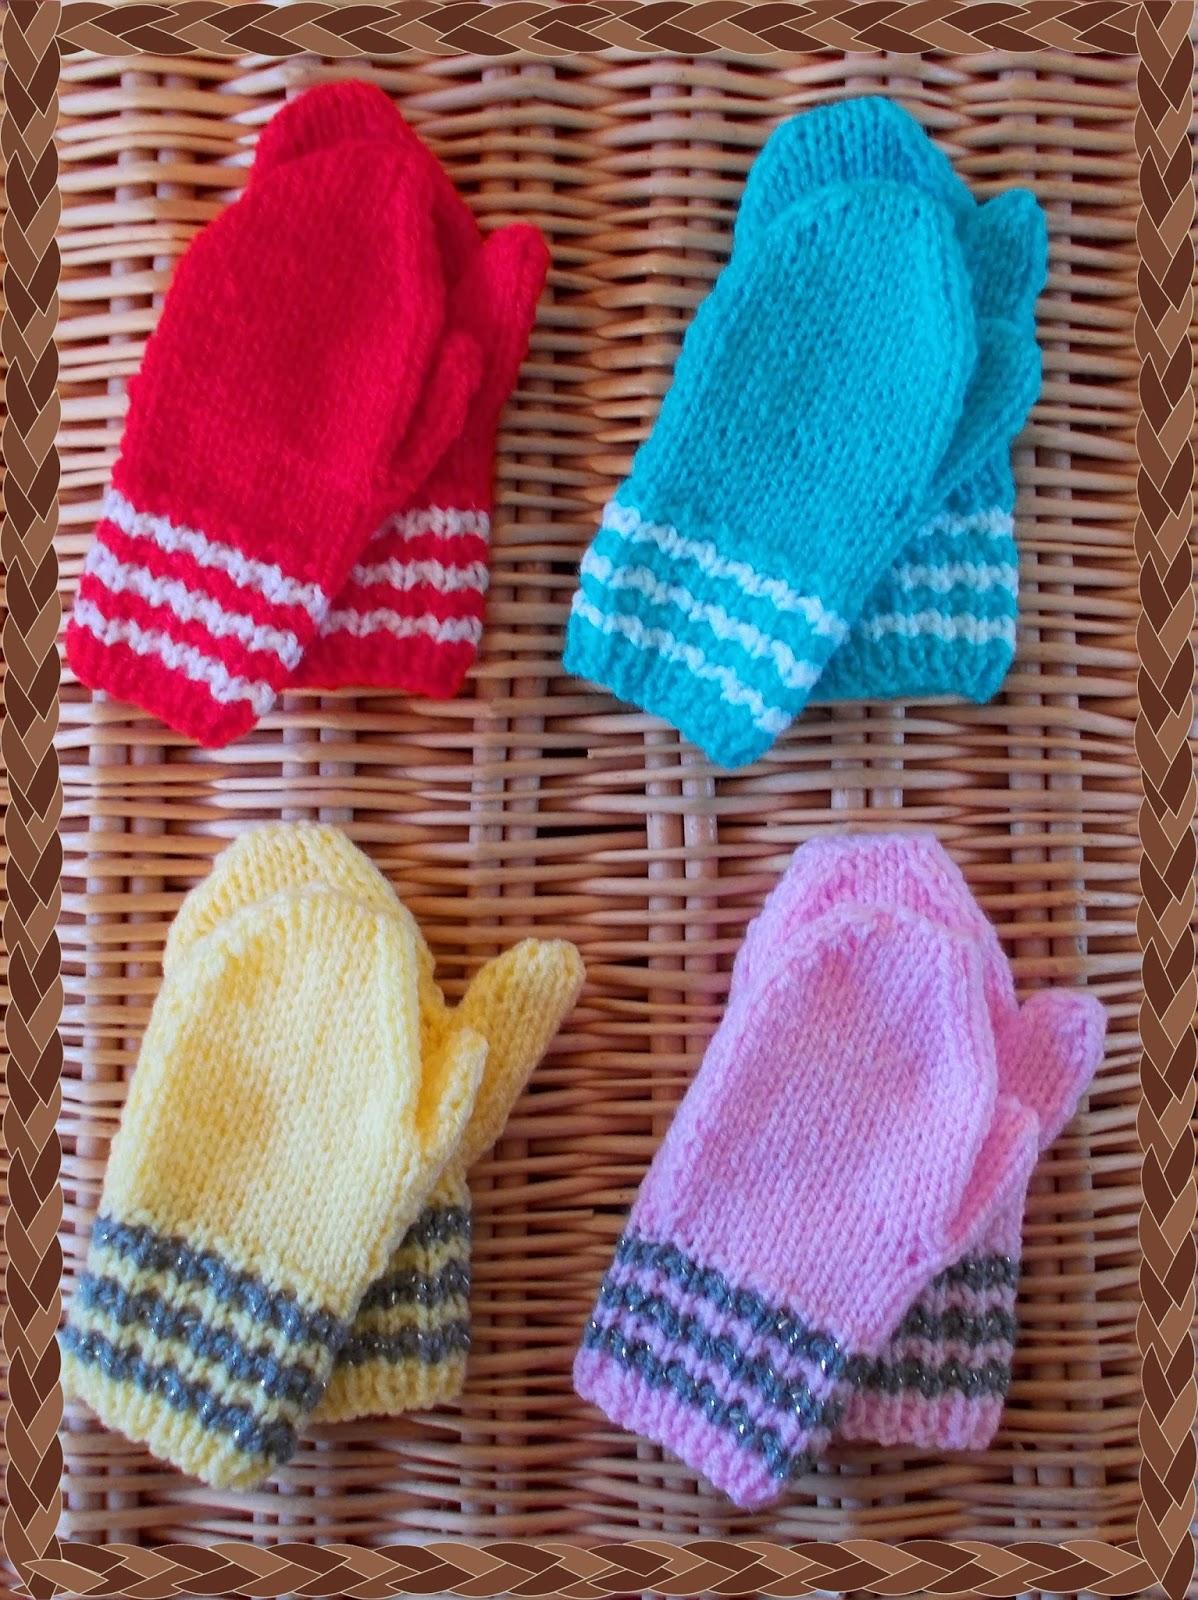 Knitting Baby Mittens Pattern Image